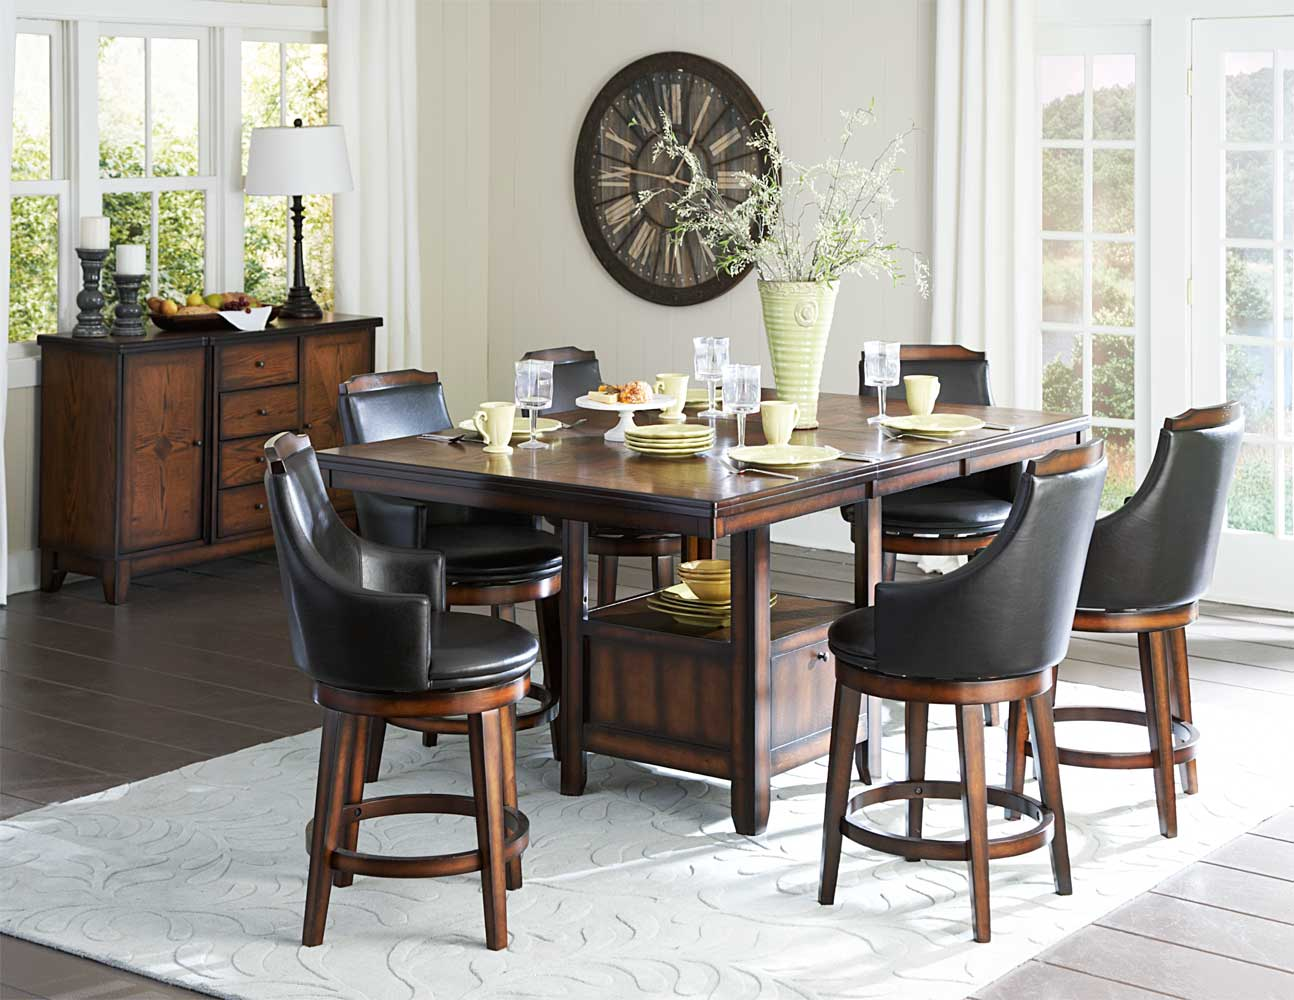 Homelegance Bayshore Counter Height Dining Set - Medium Walnut